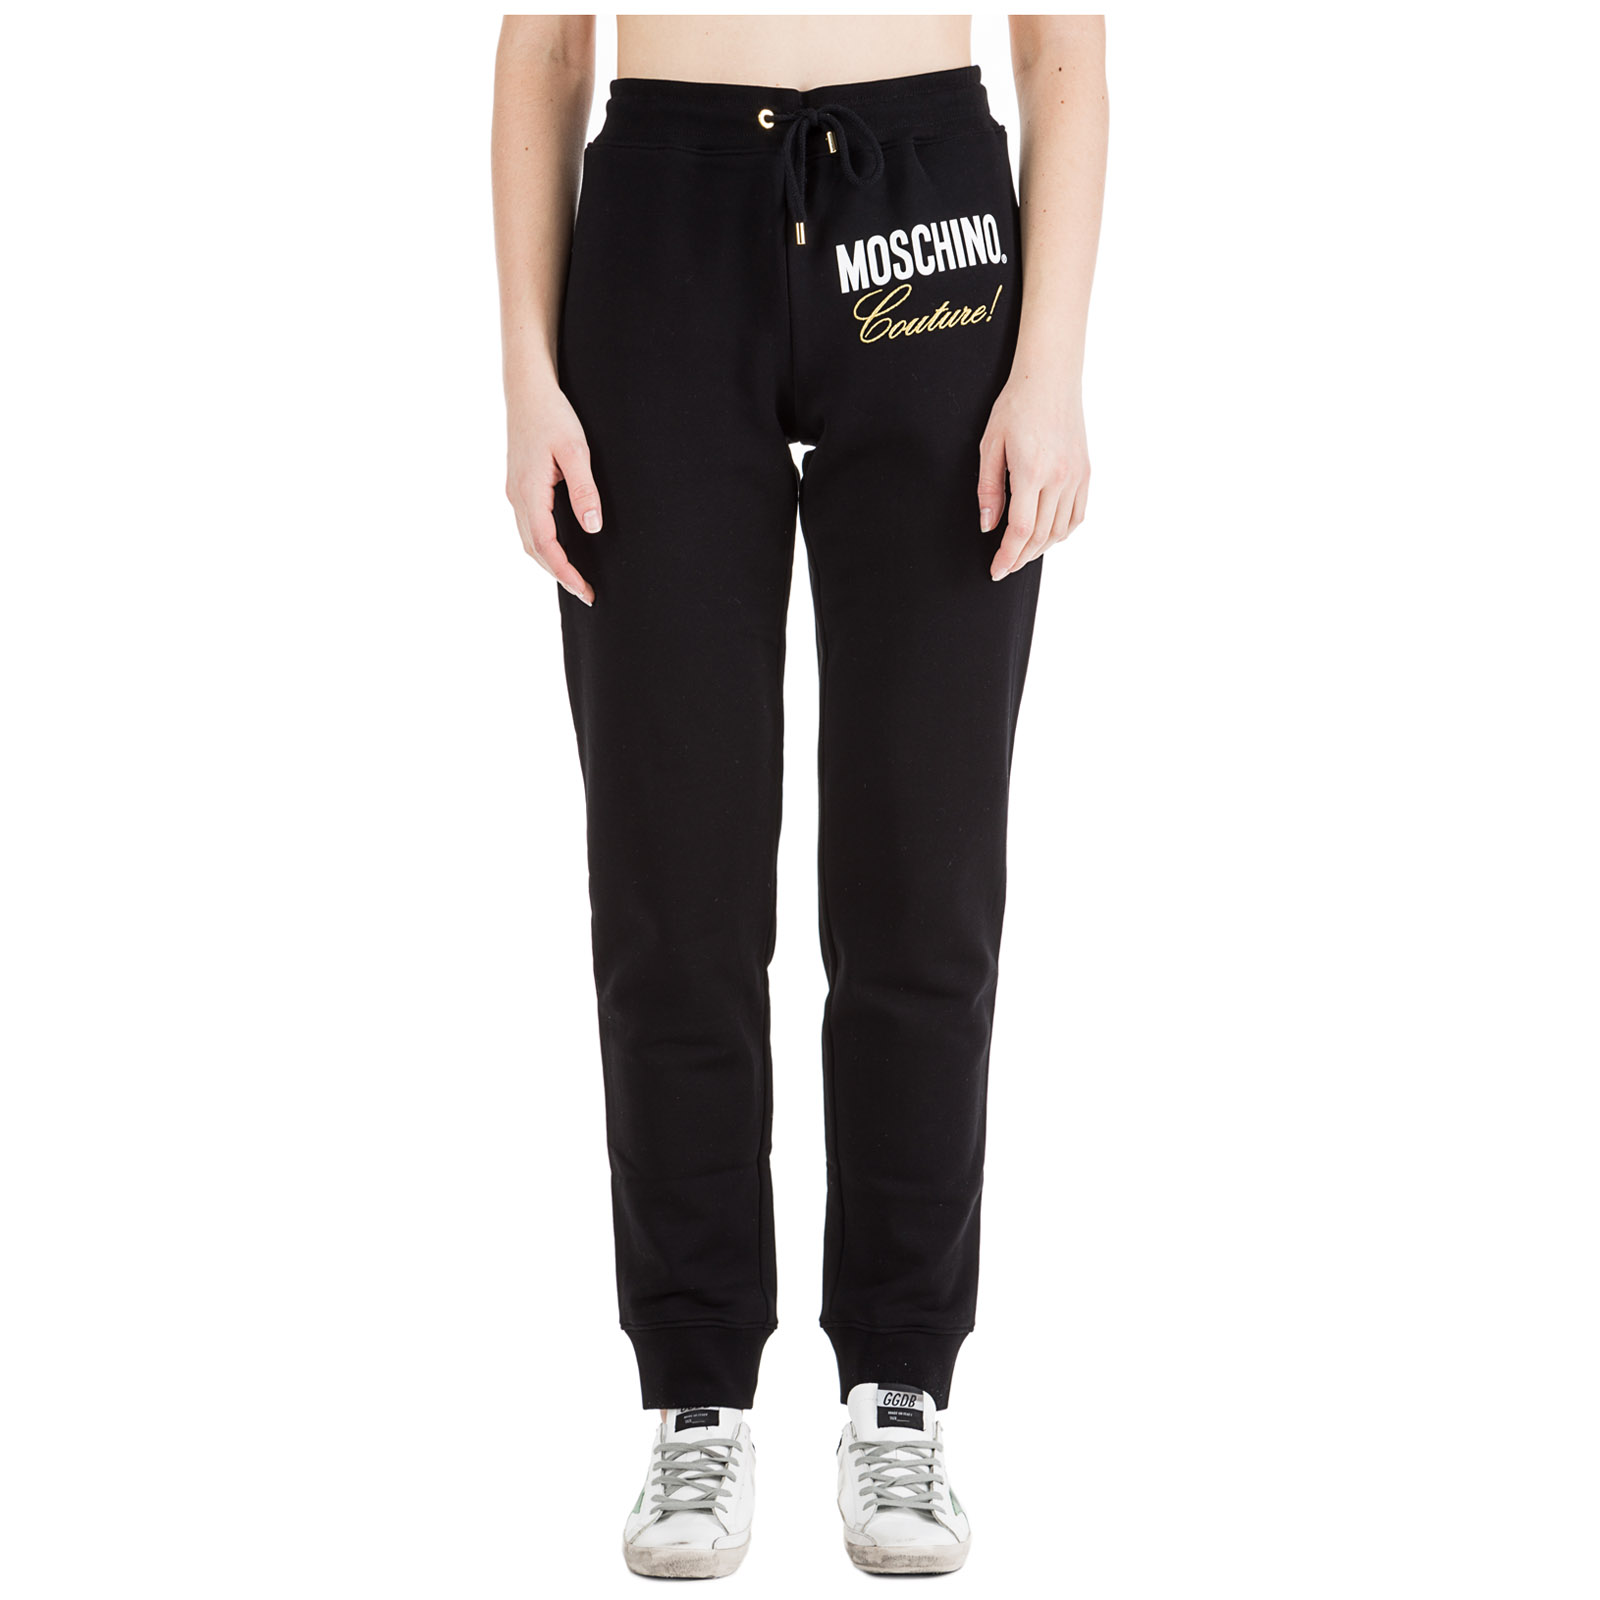 Donna Nero Tuta Nero Tuta Pantalone Fashion Pantalone Donna Fashion xdBrCtshQ